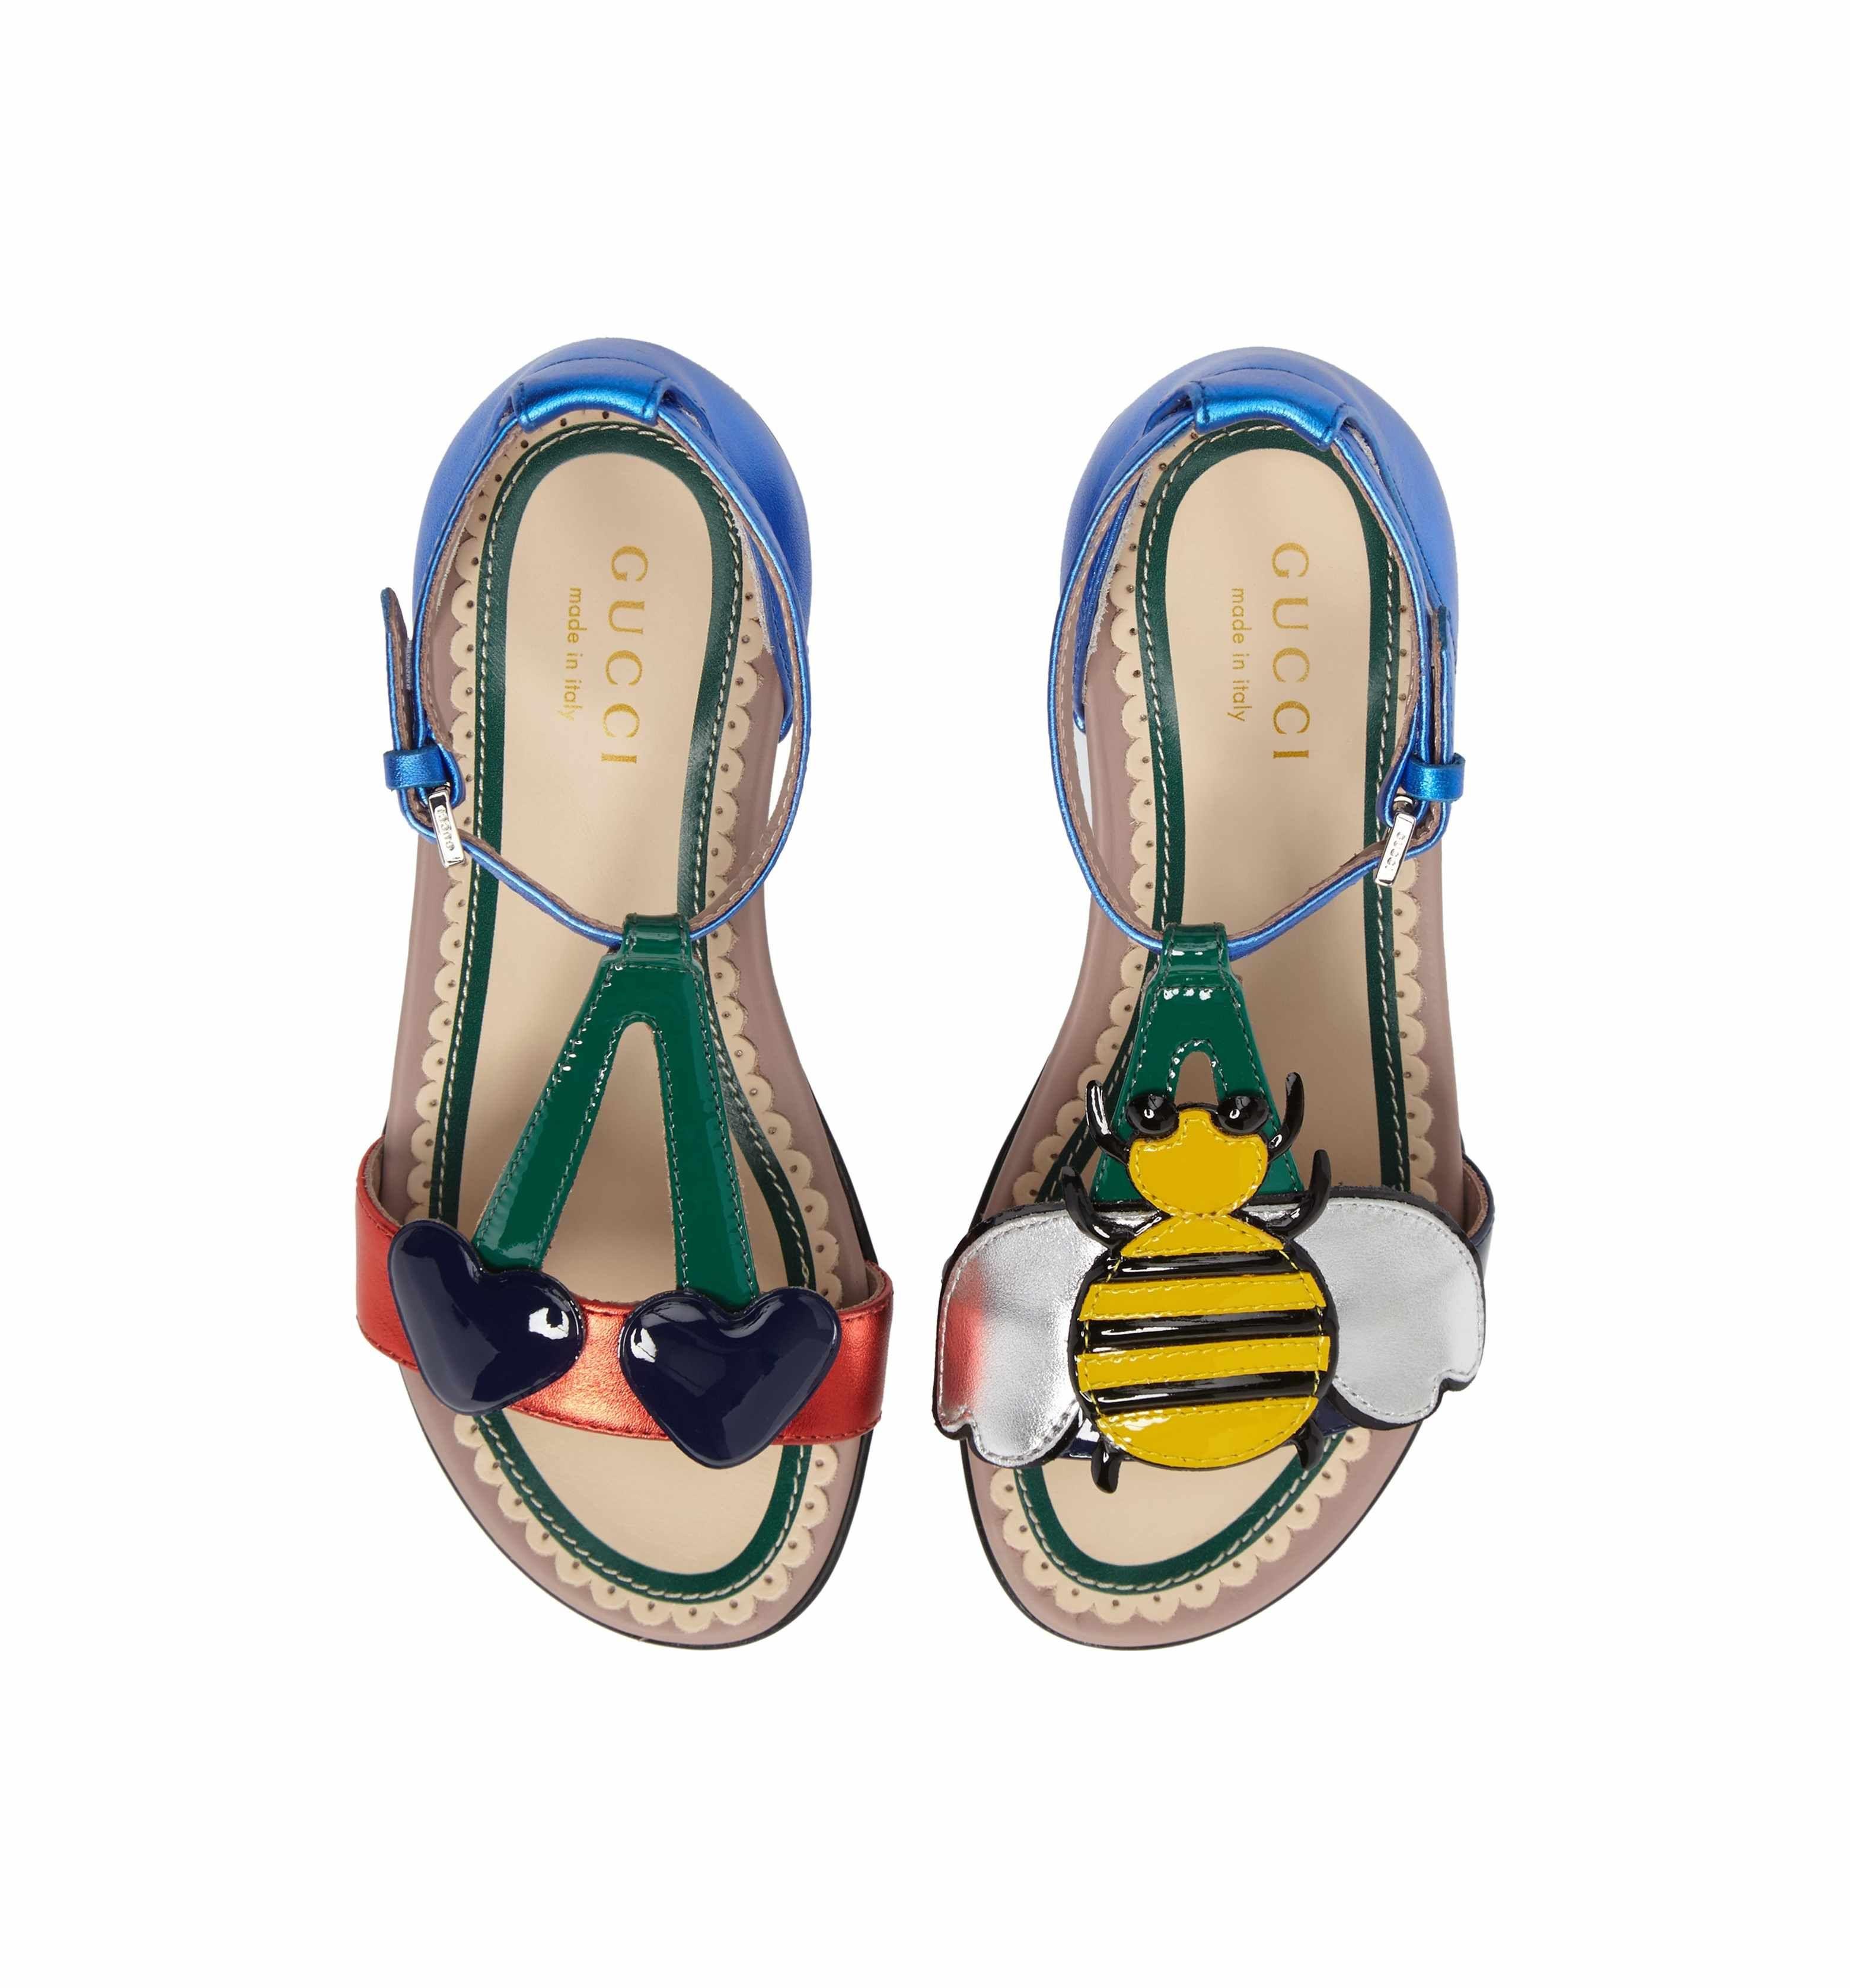 3e48155b Gucci Bee Cerise Sandal (Toddler & Little Kid)   Anime   Kids ...